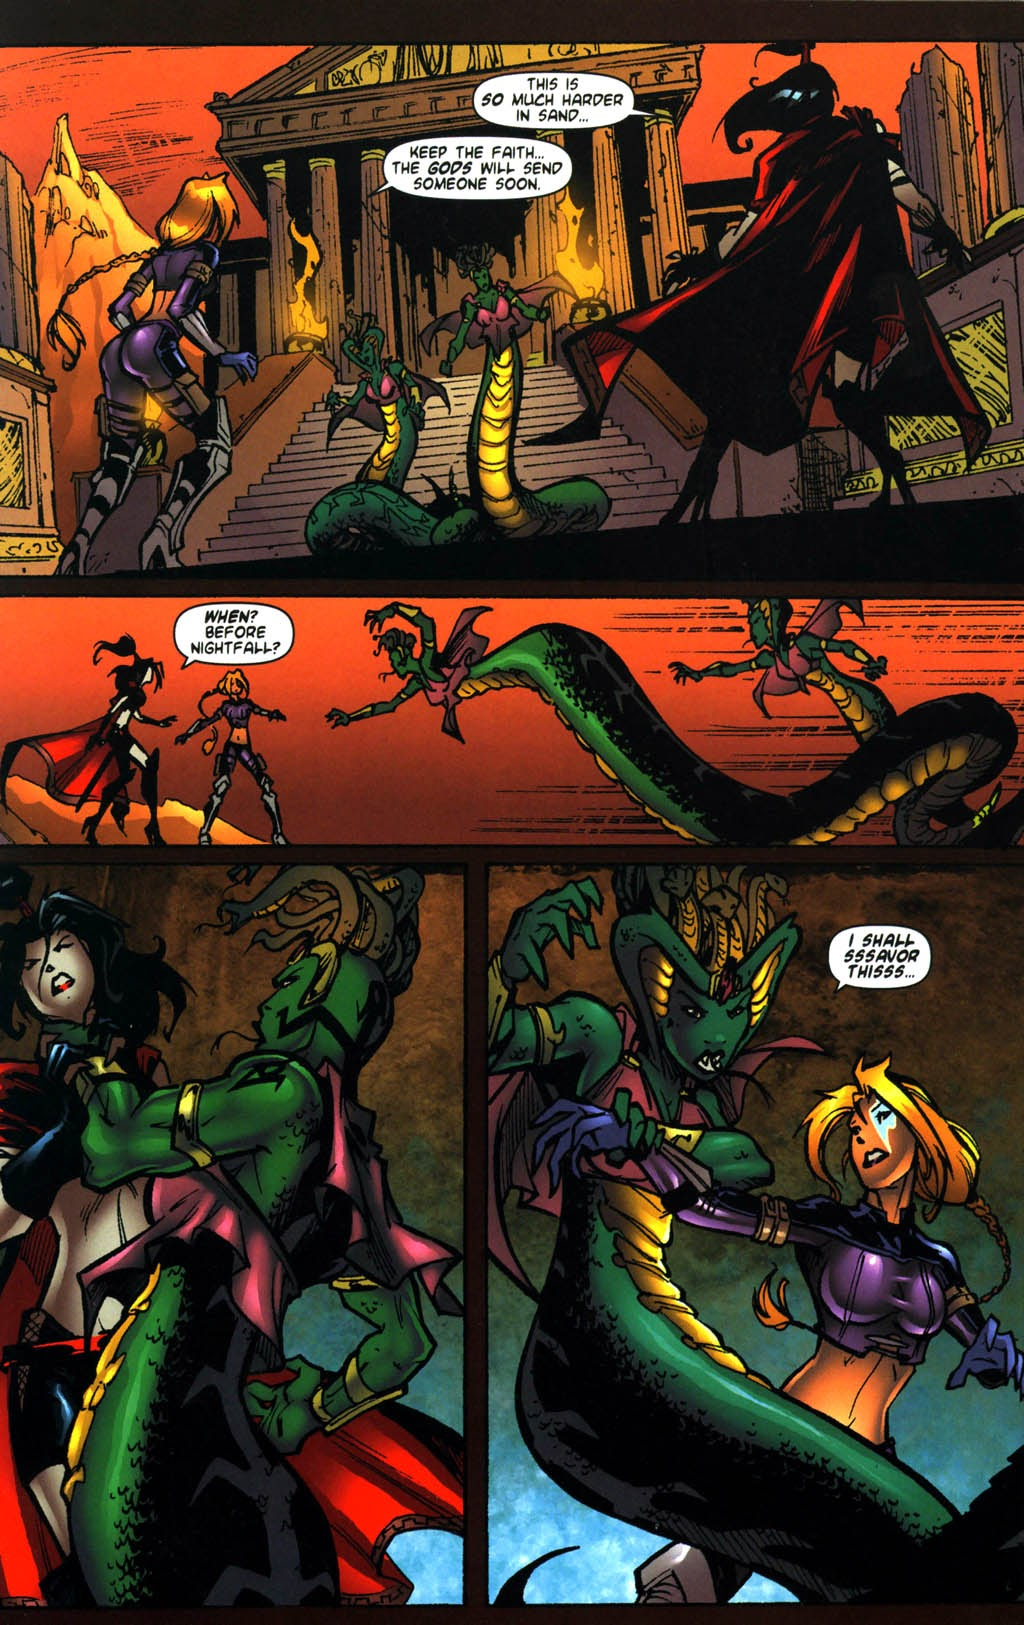 Ezra vs. 10th Muse | Viewcomic reading comics online for free 2021